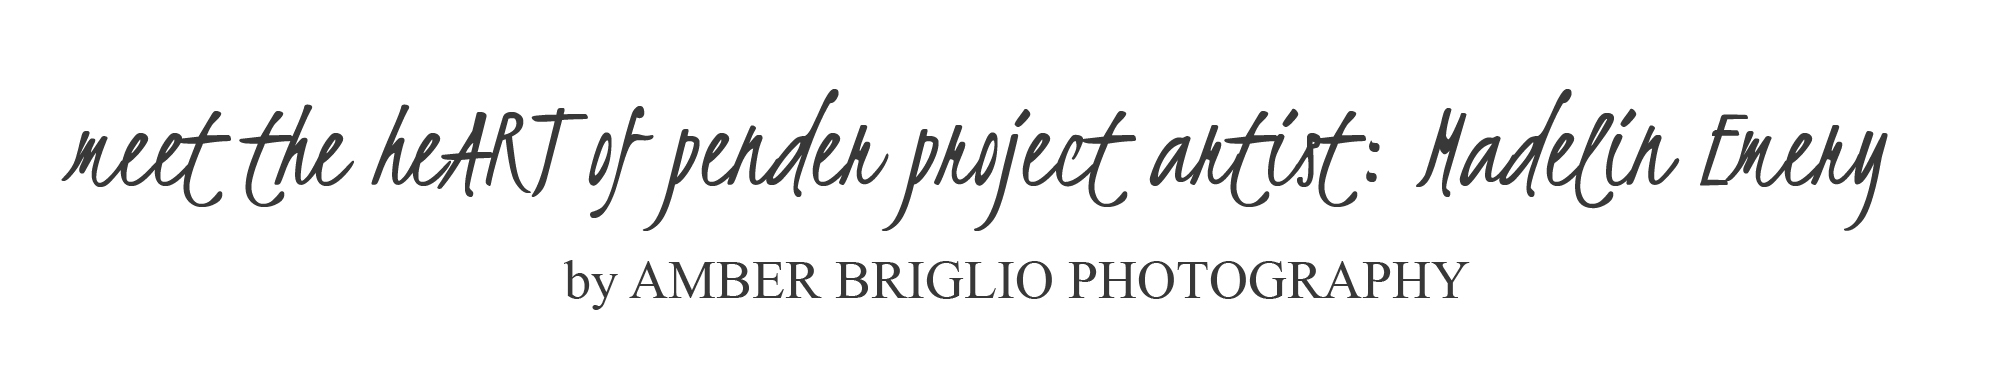 Pender Island Artist - Amber Briglio Photography